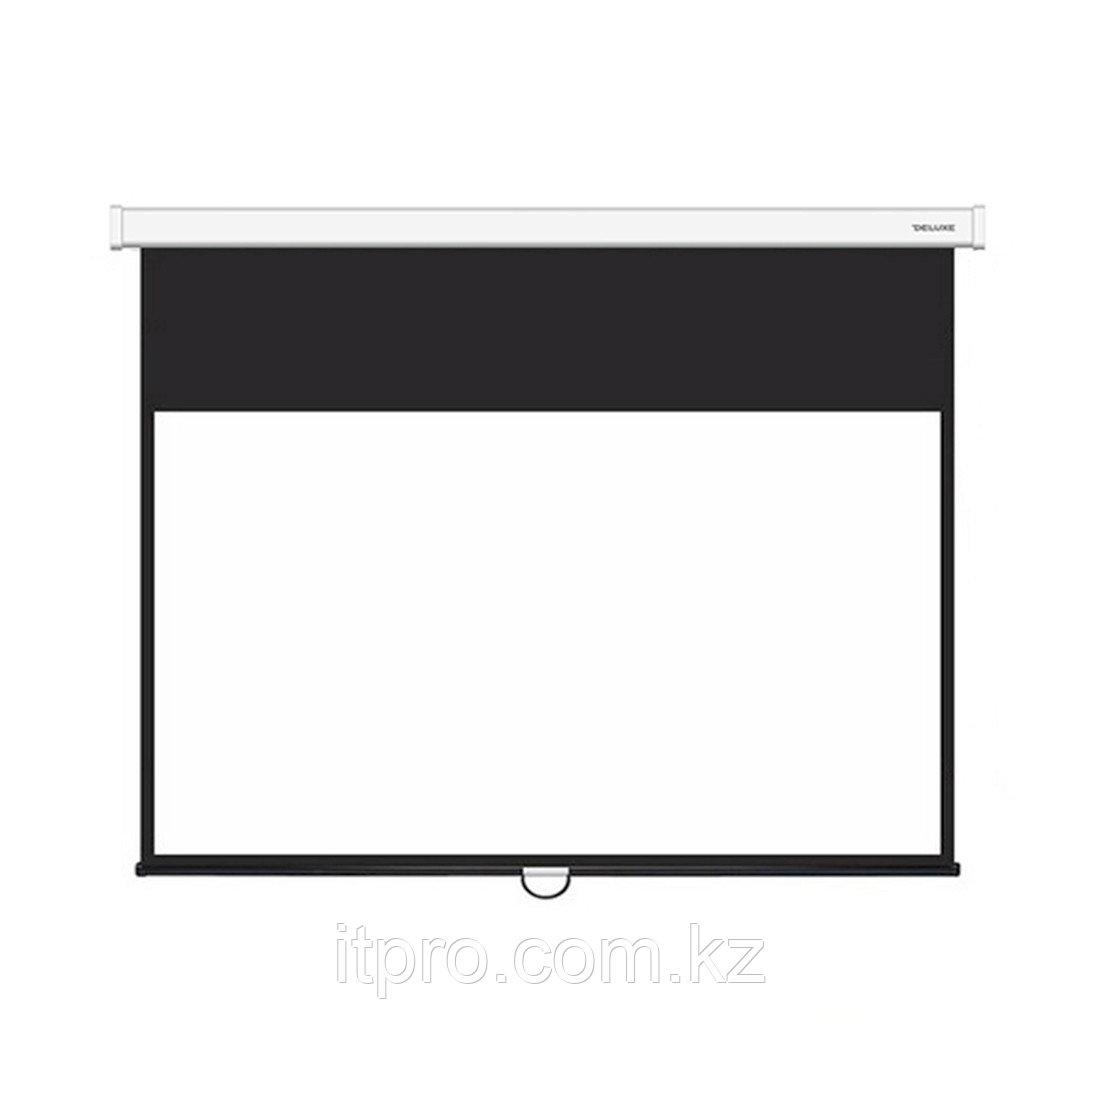 Экран настенный Deluxe DLS-M300x180W